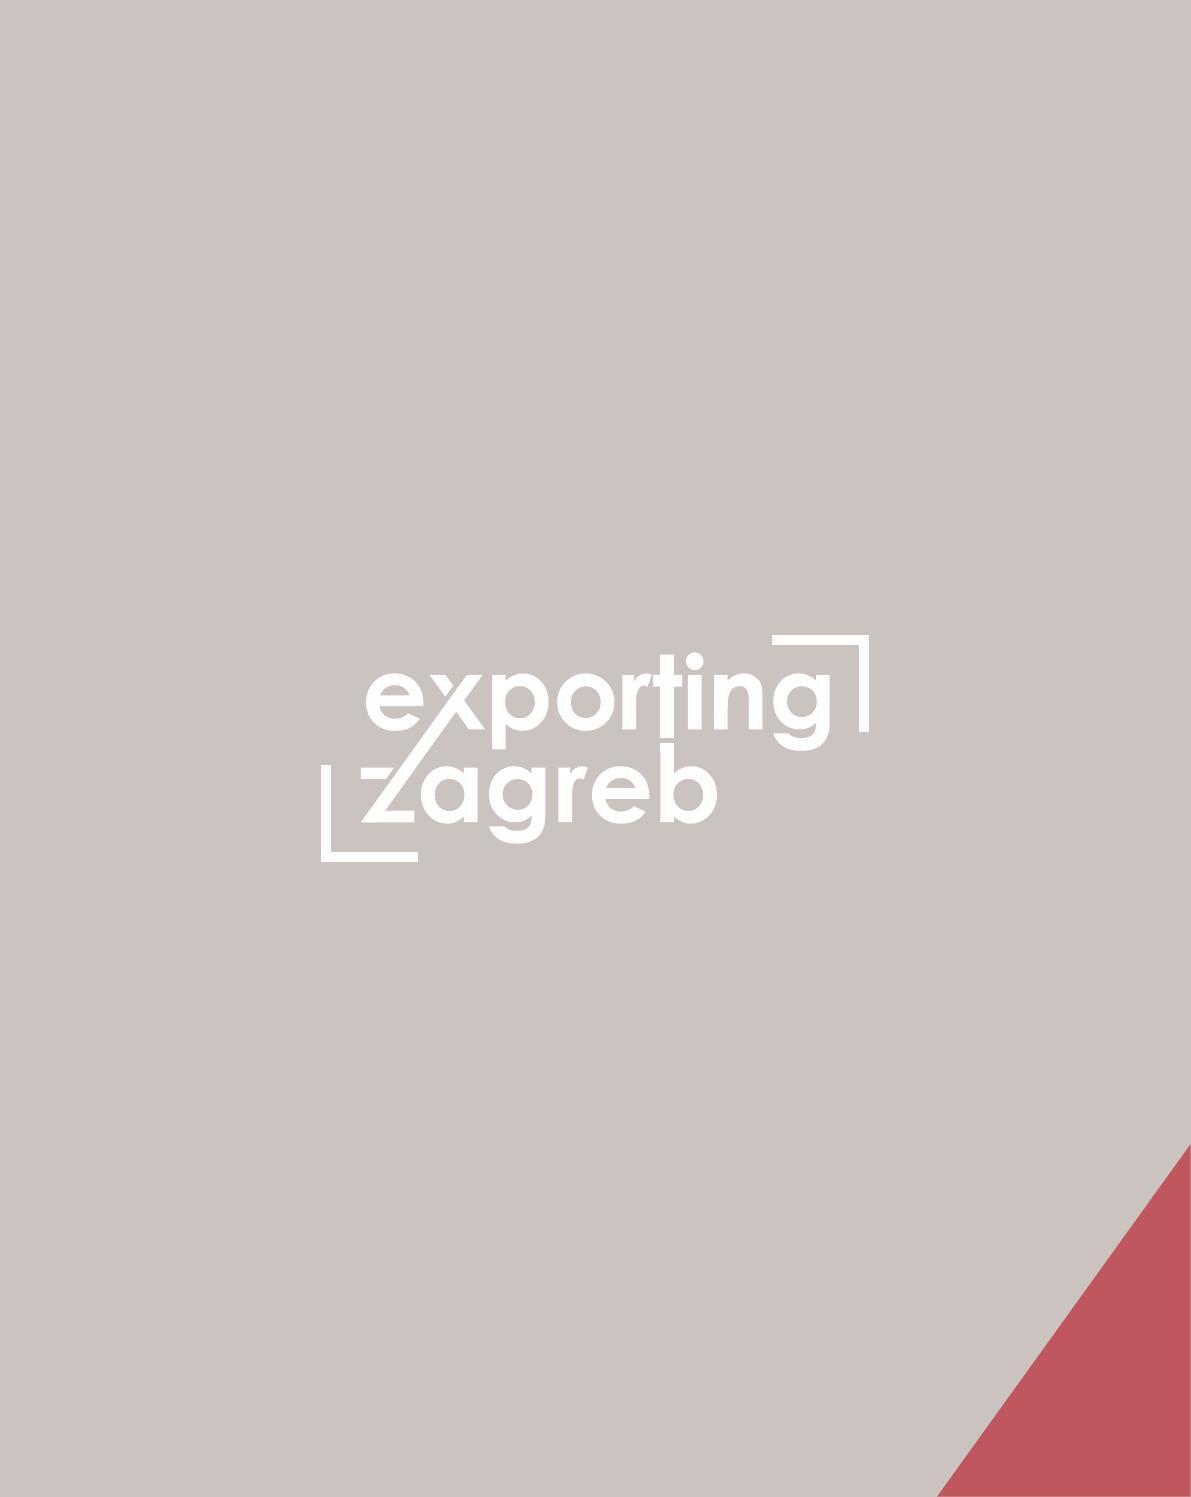 ^ xporting Zagreb katalog web by HDLU - issuu